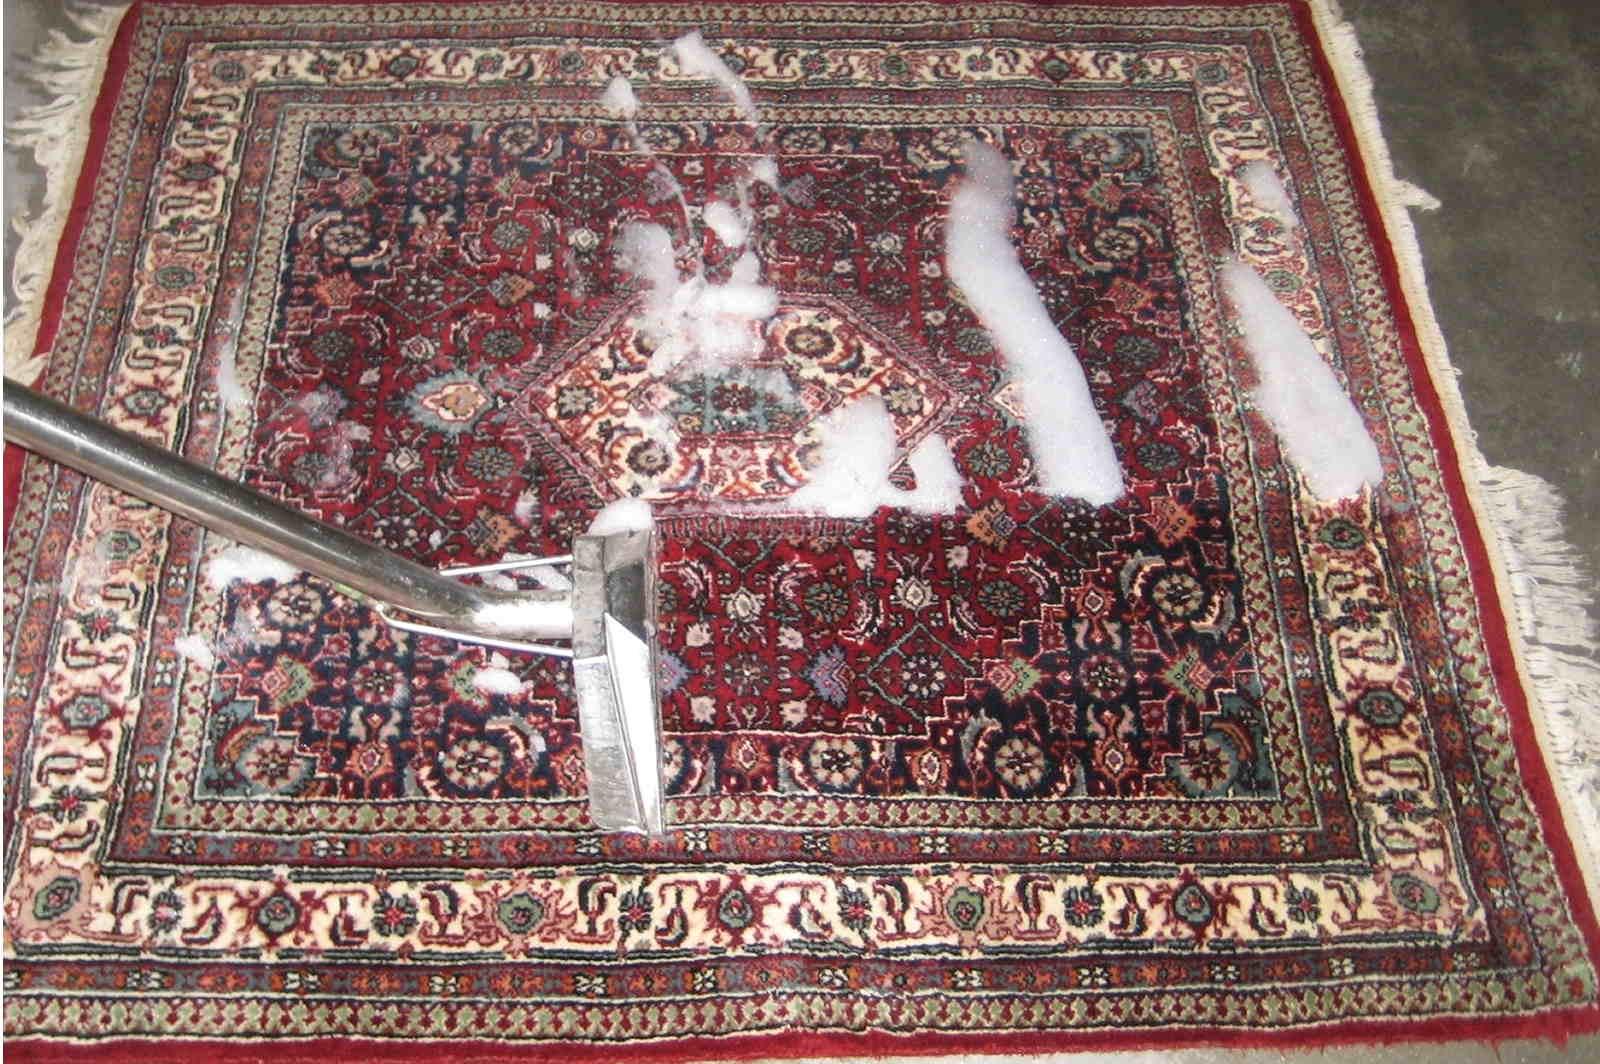 carpet cleaning hong kong, carpet cleaner hong kong, oriental rug cleaning, Carpet Cleaners ...